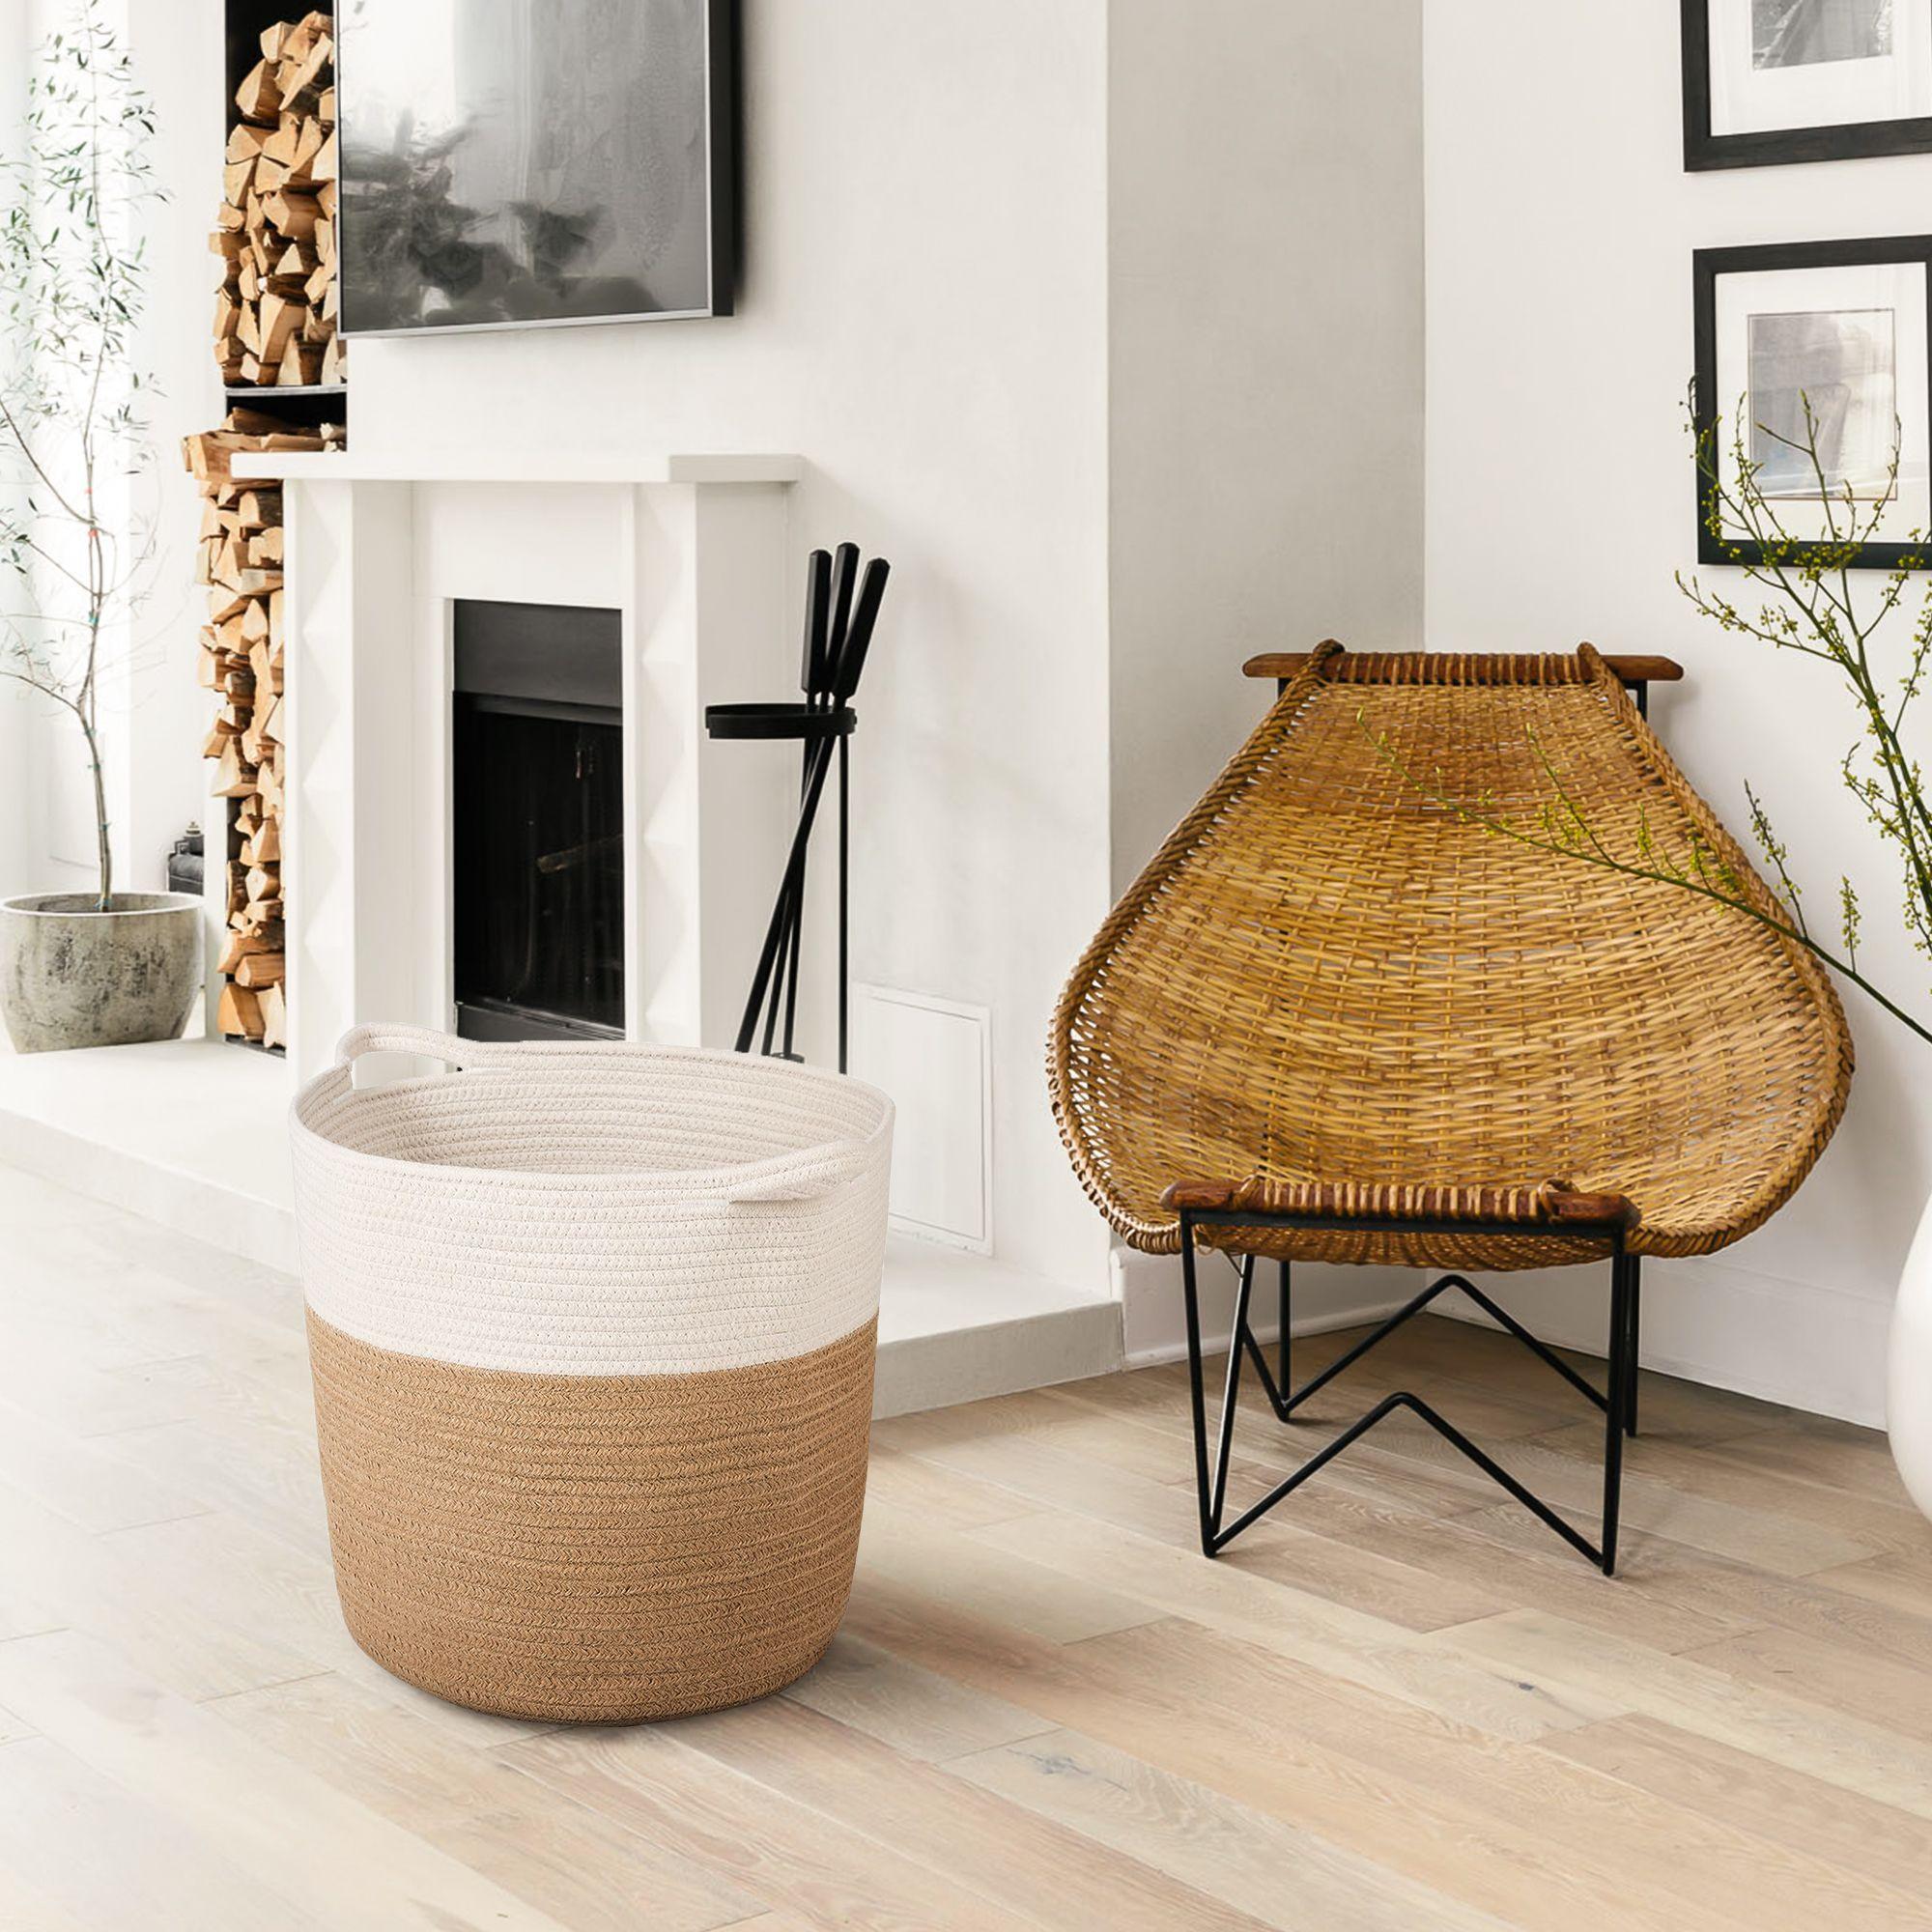 Xl Jute Rope Woven Laundry Basket With Handles Baby Hamper Bedroom